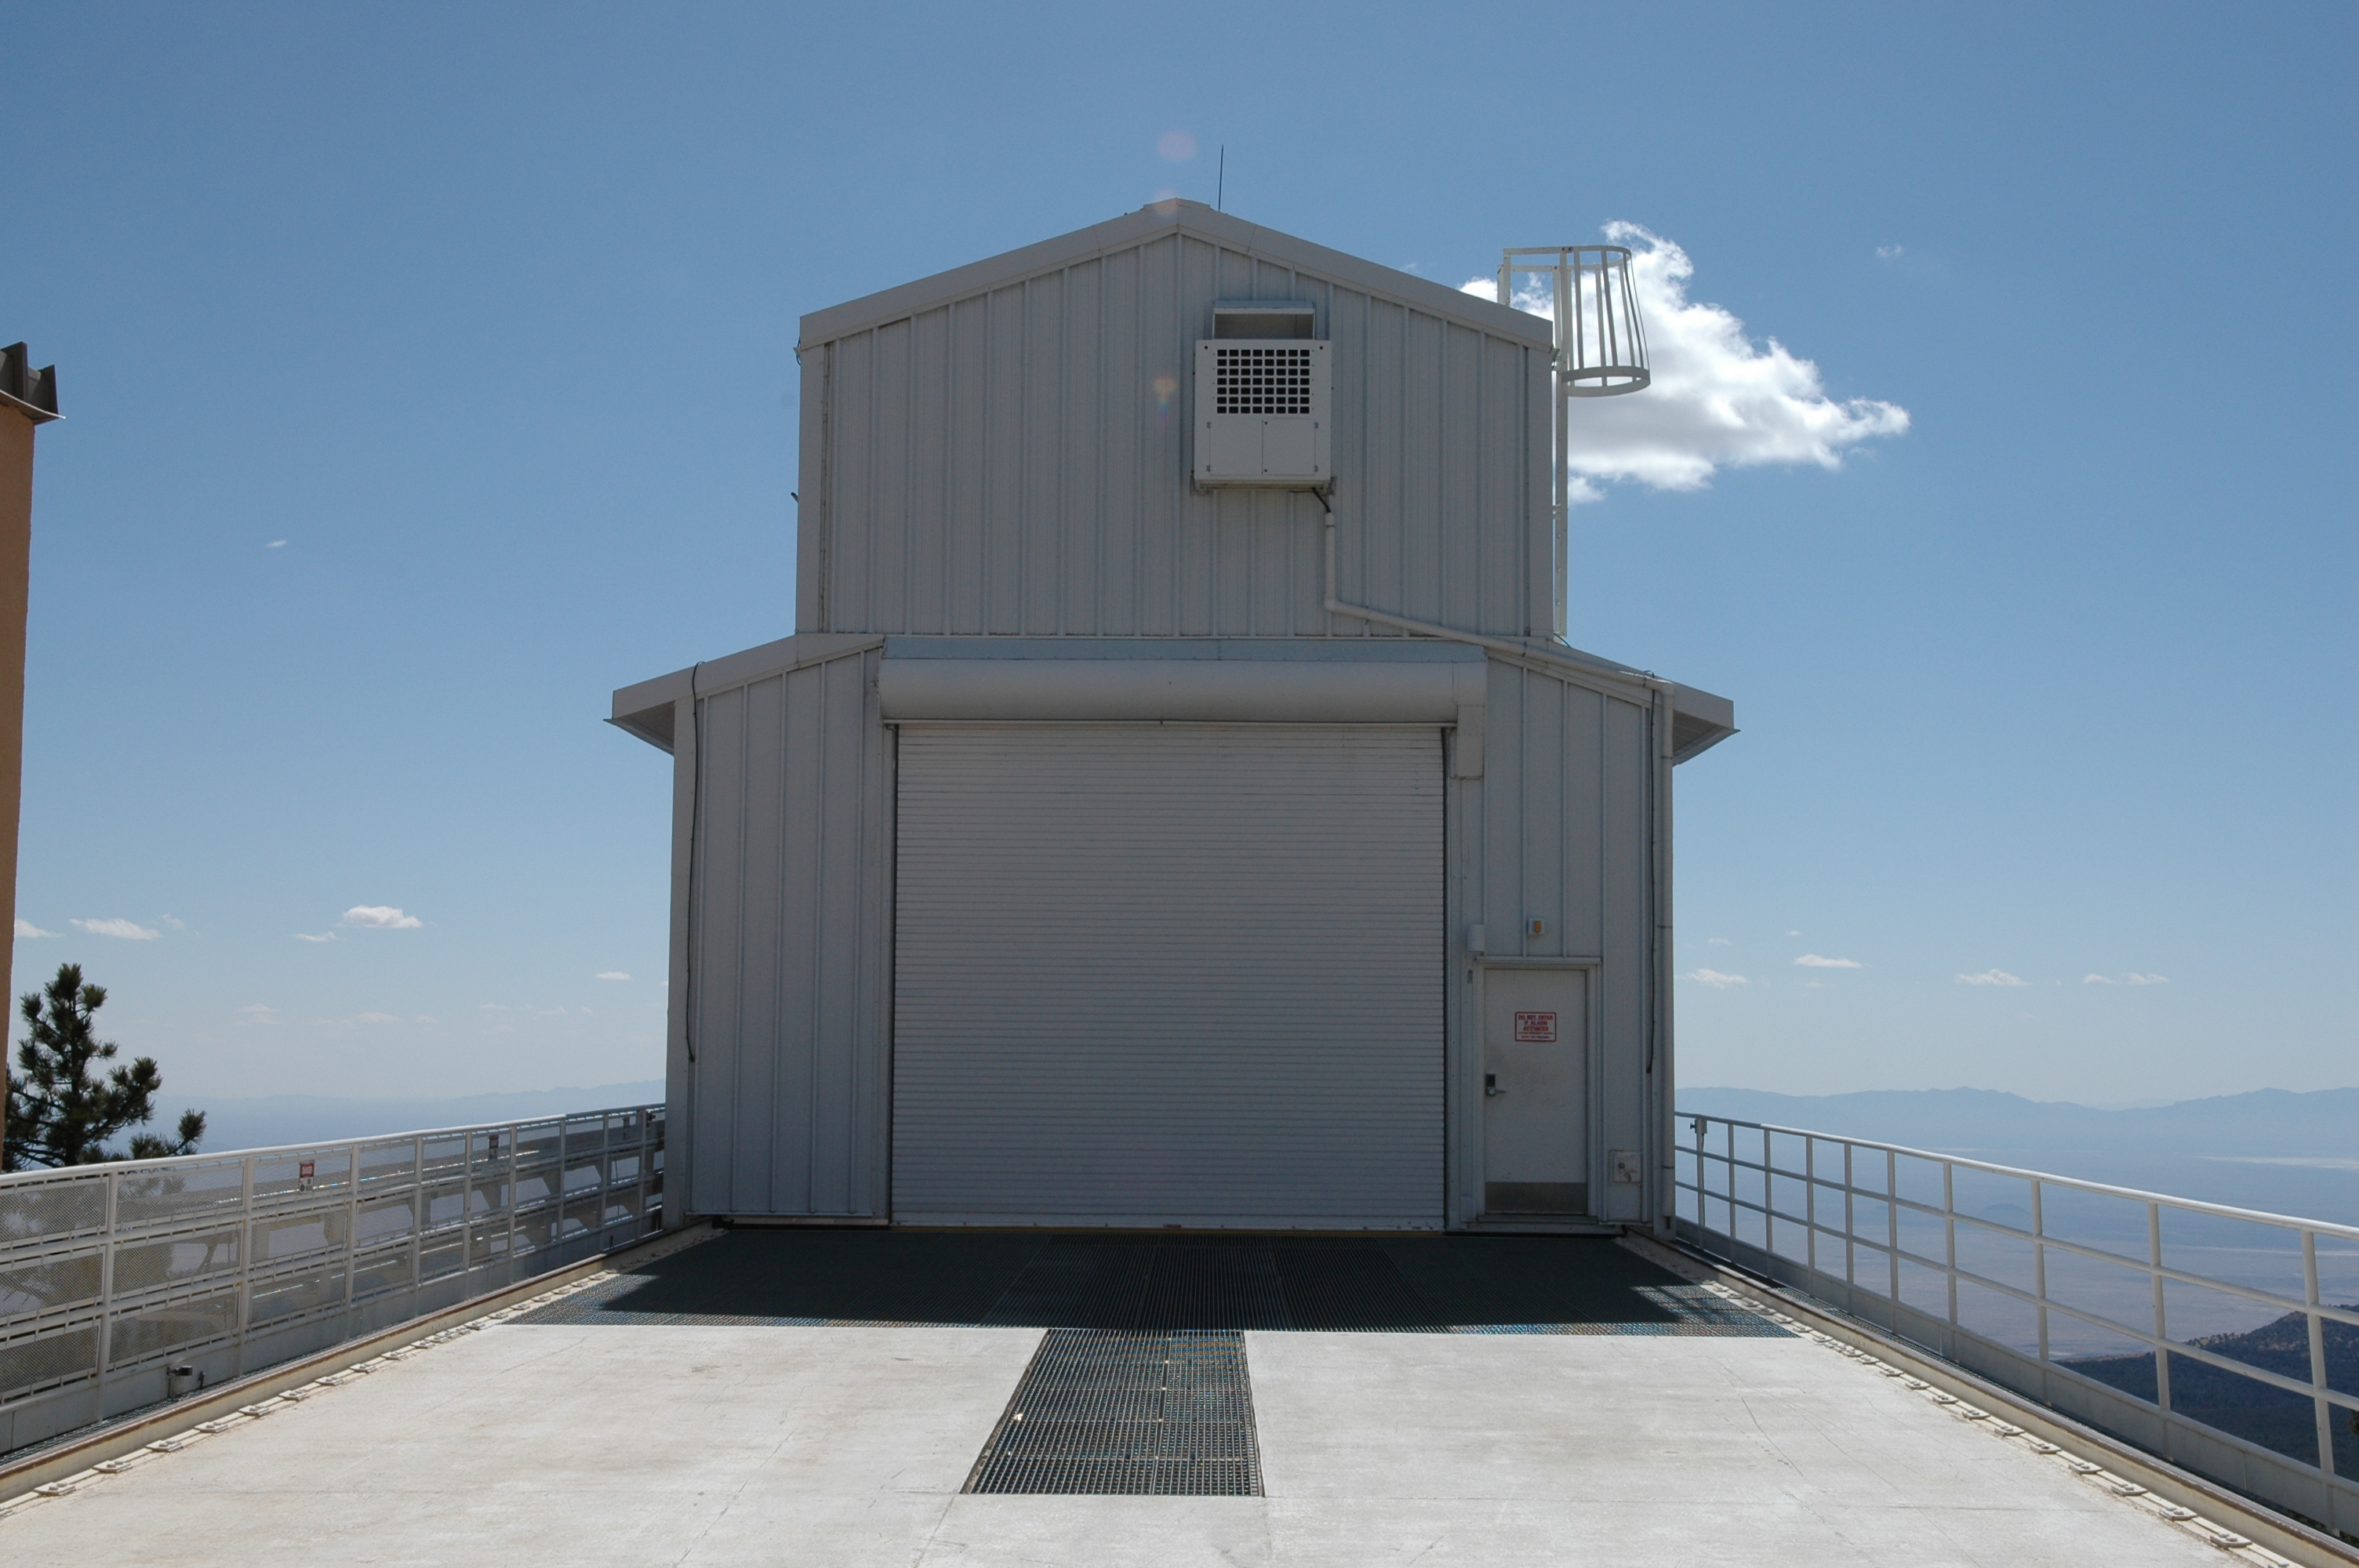 Housing, 2.5m Sloan Telescope, Apache Point Observatory